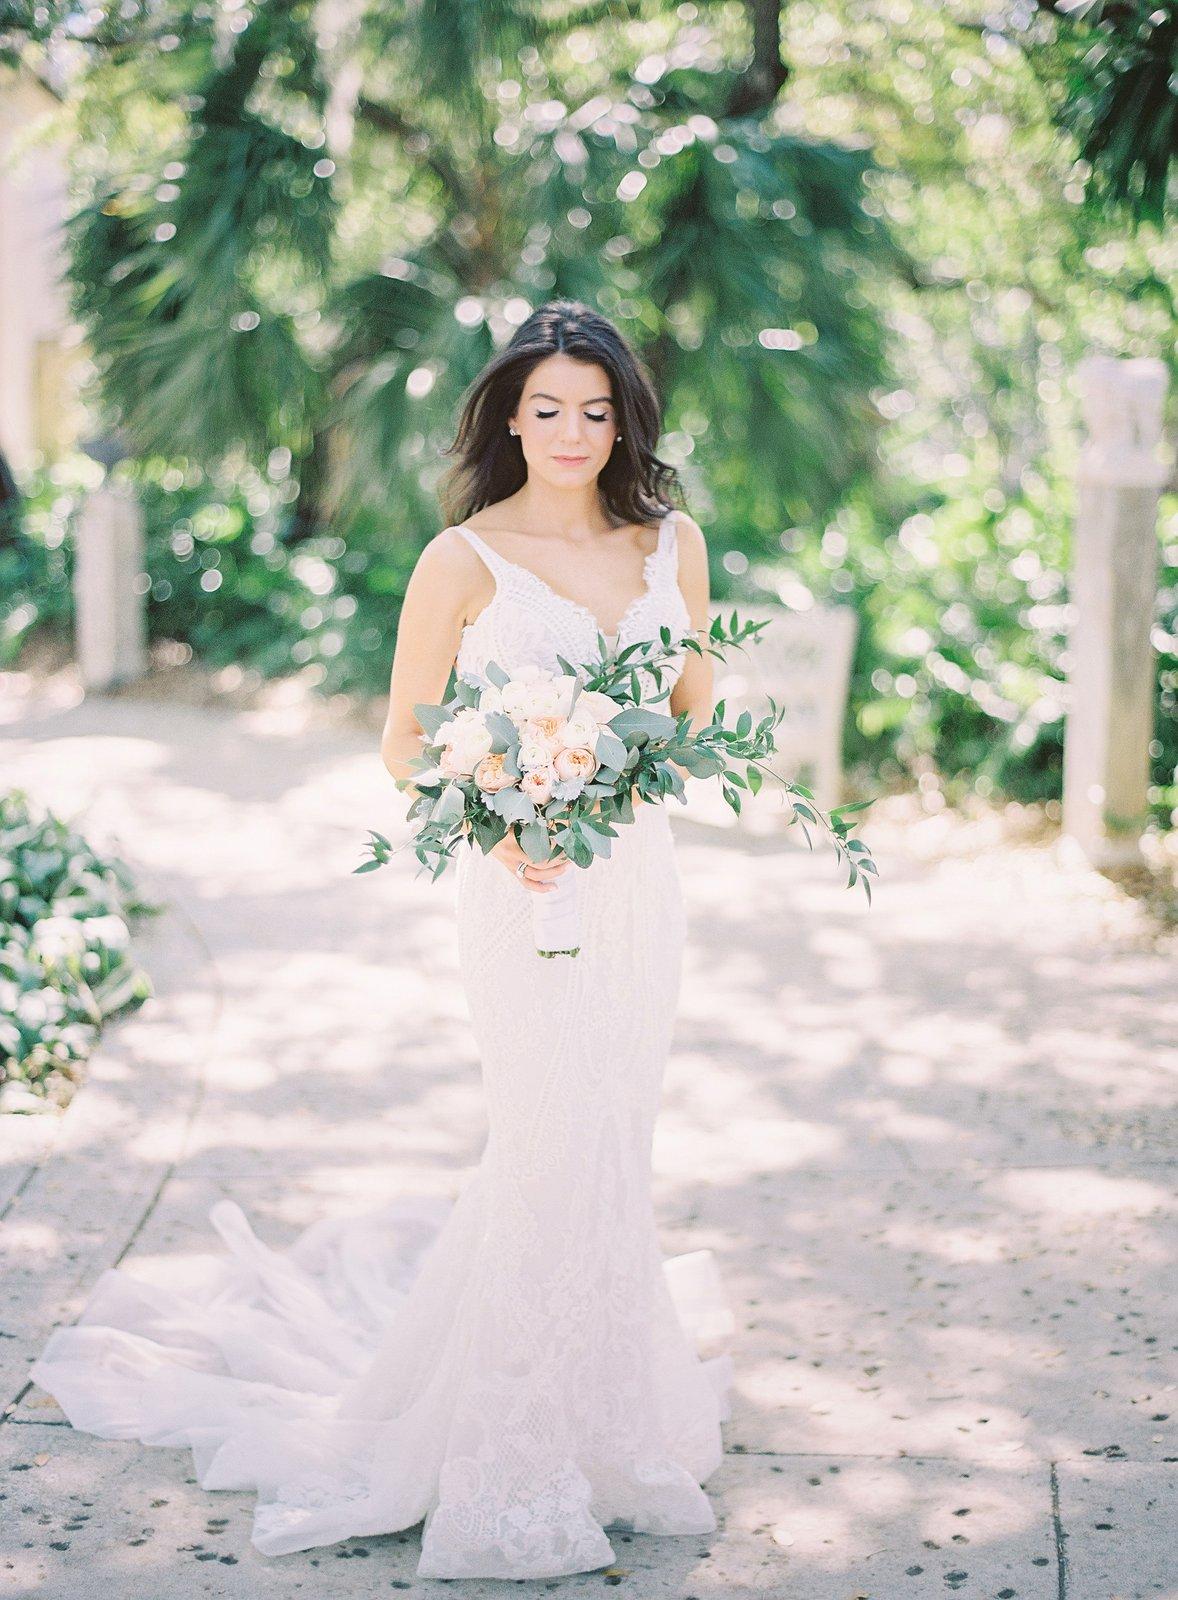 DIFFERENCE BETWEEN FILM AND DIGITAL WEDDING PHOTOGRAPHY, Miami Wedding Photographers   Häring Photography, Indian Wedding Photographer in Florida, Best Muslim, Hindu - South East Asian Wedding Photographers